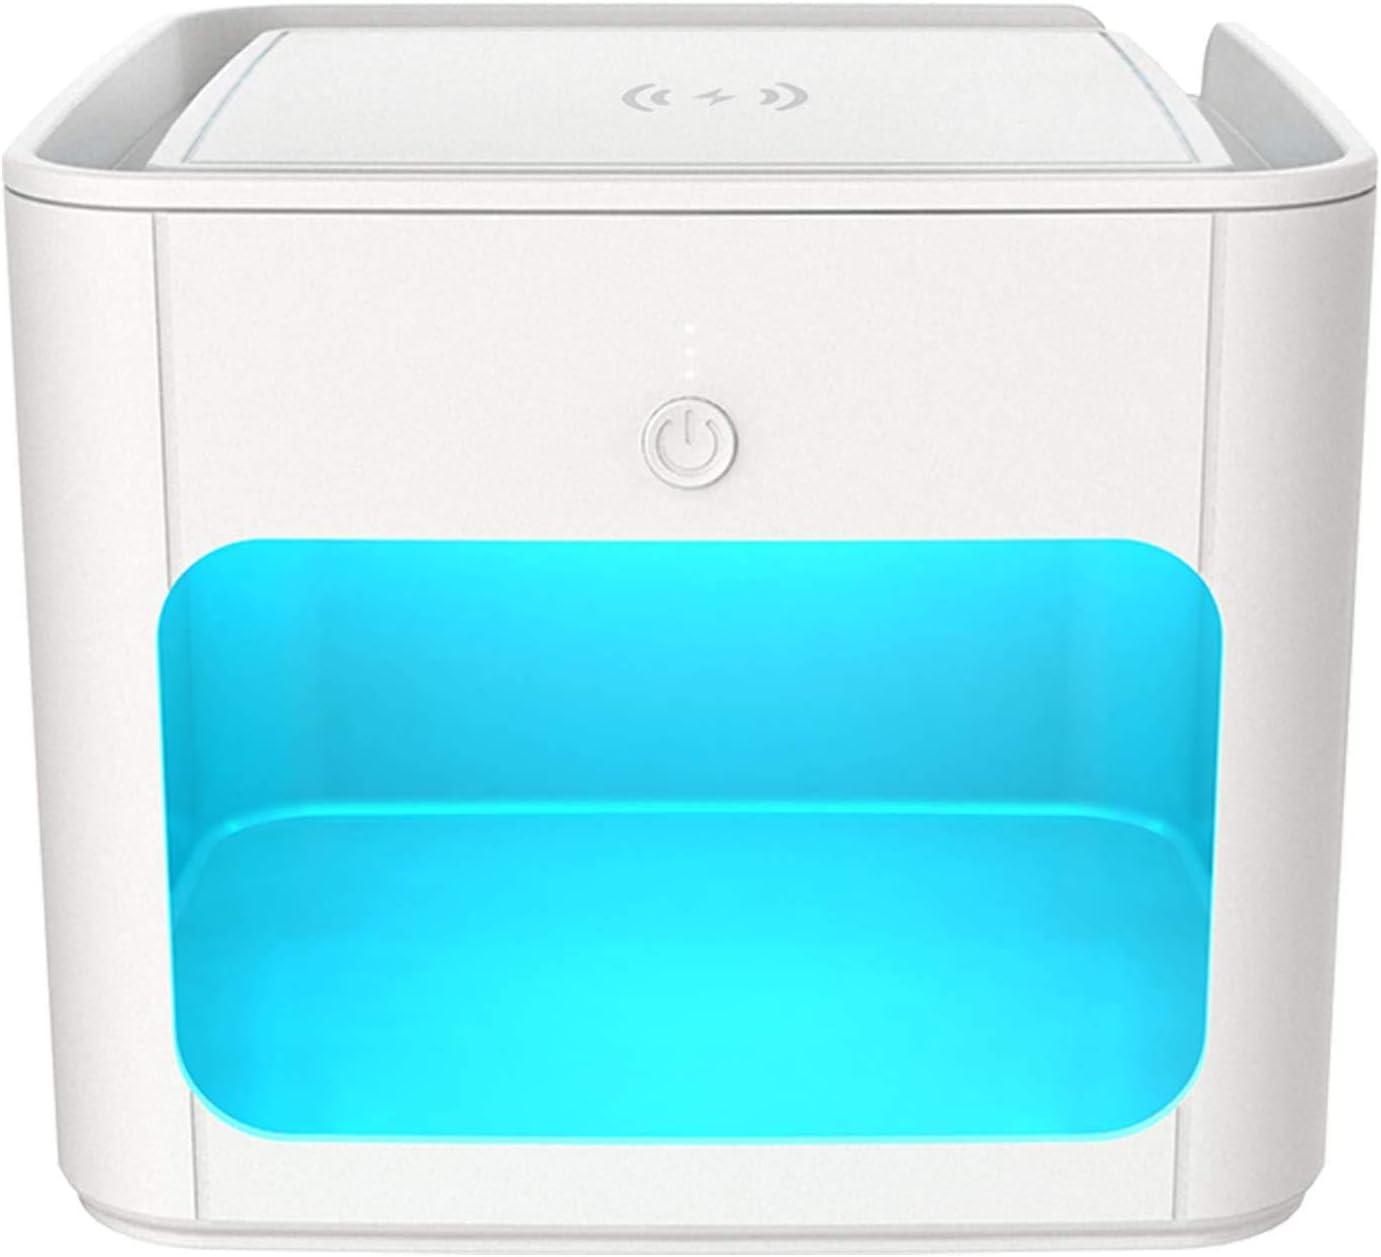 MAXBROTHERS Sterilizer Box,UV Steriliser,Multi-Function UV Light Sterilizer Fast Sterilization 99/% in 5 mins